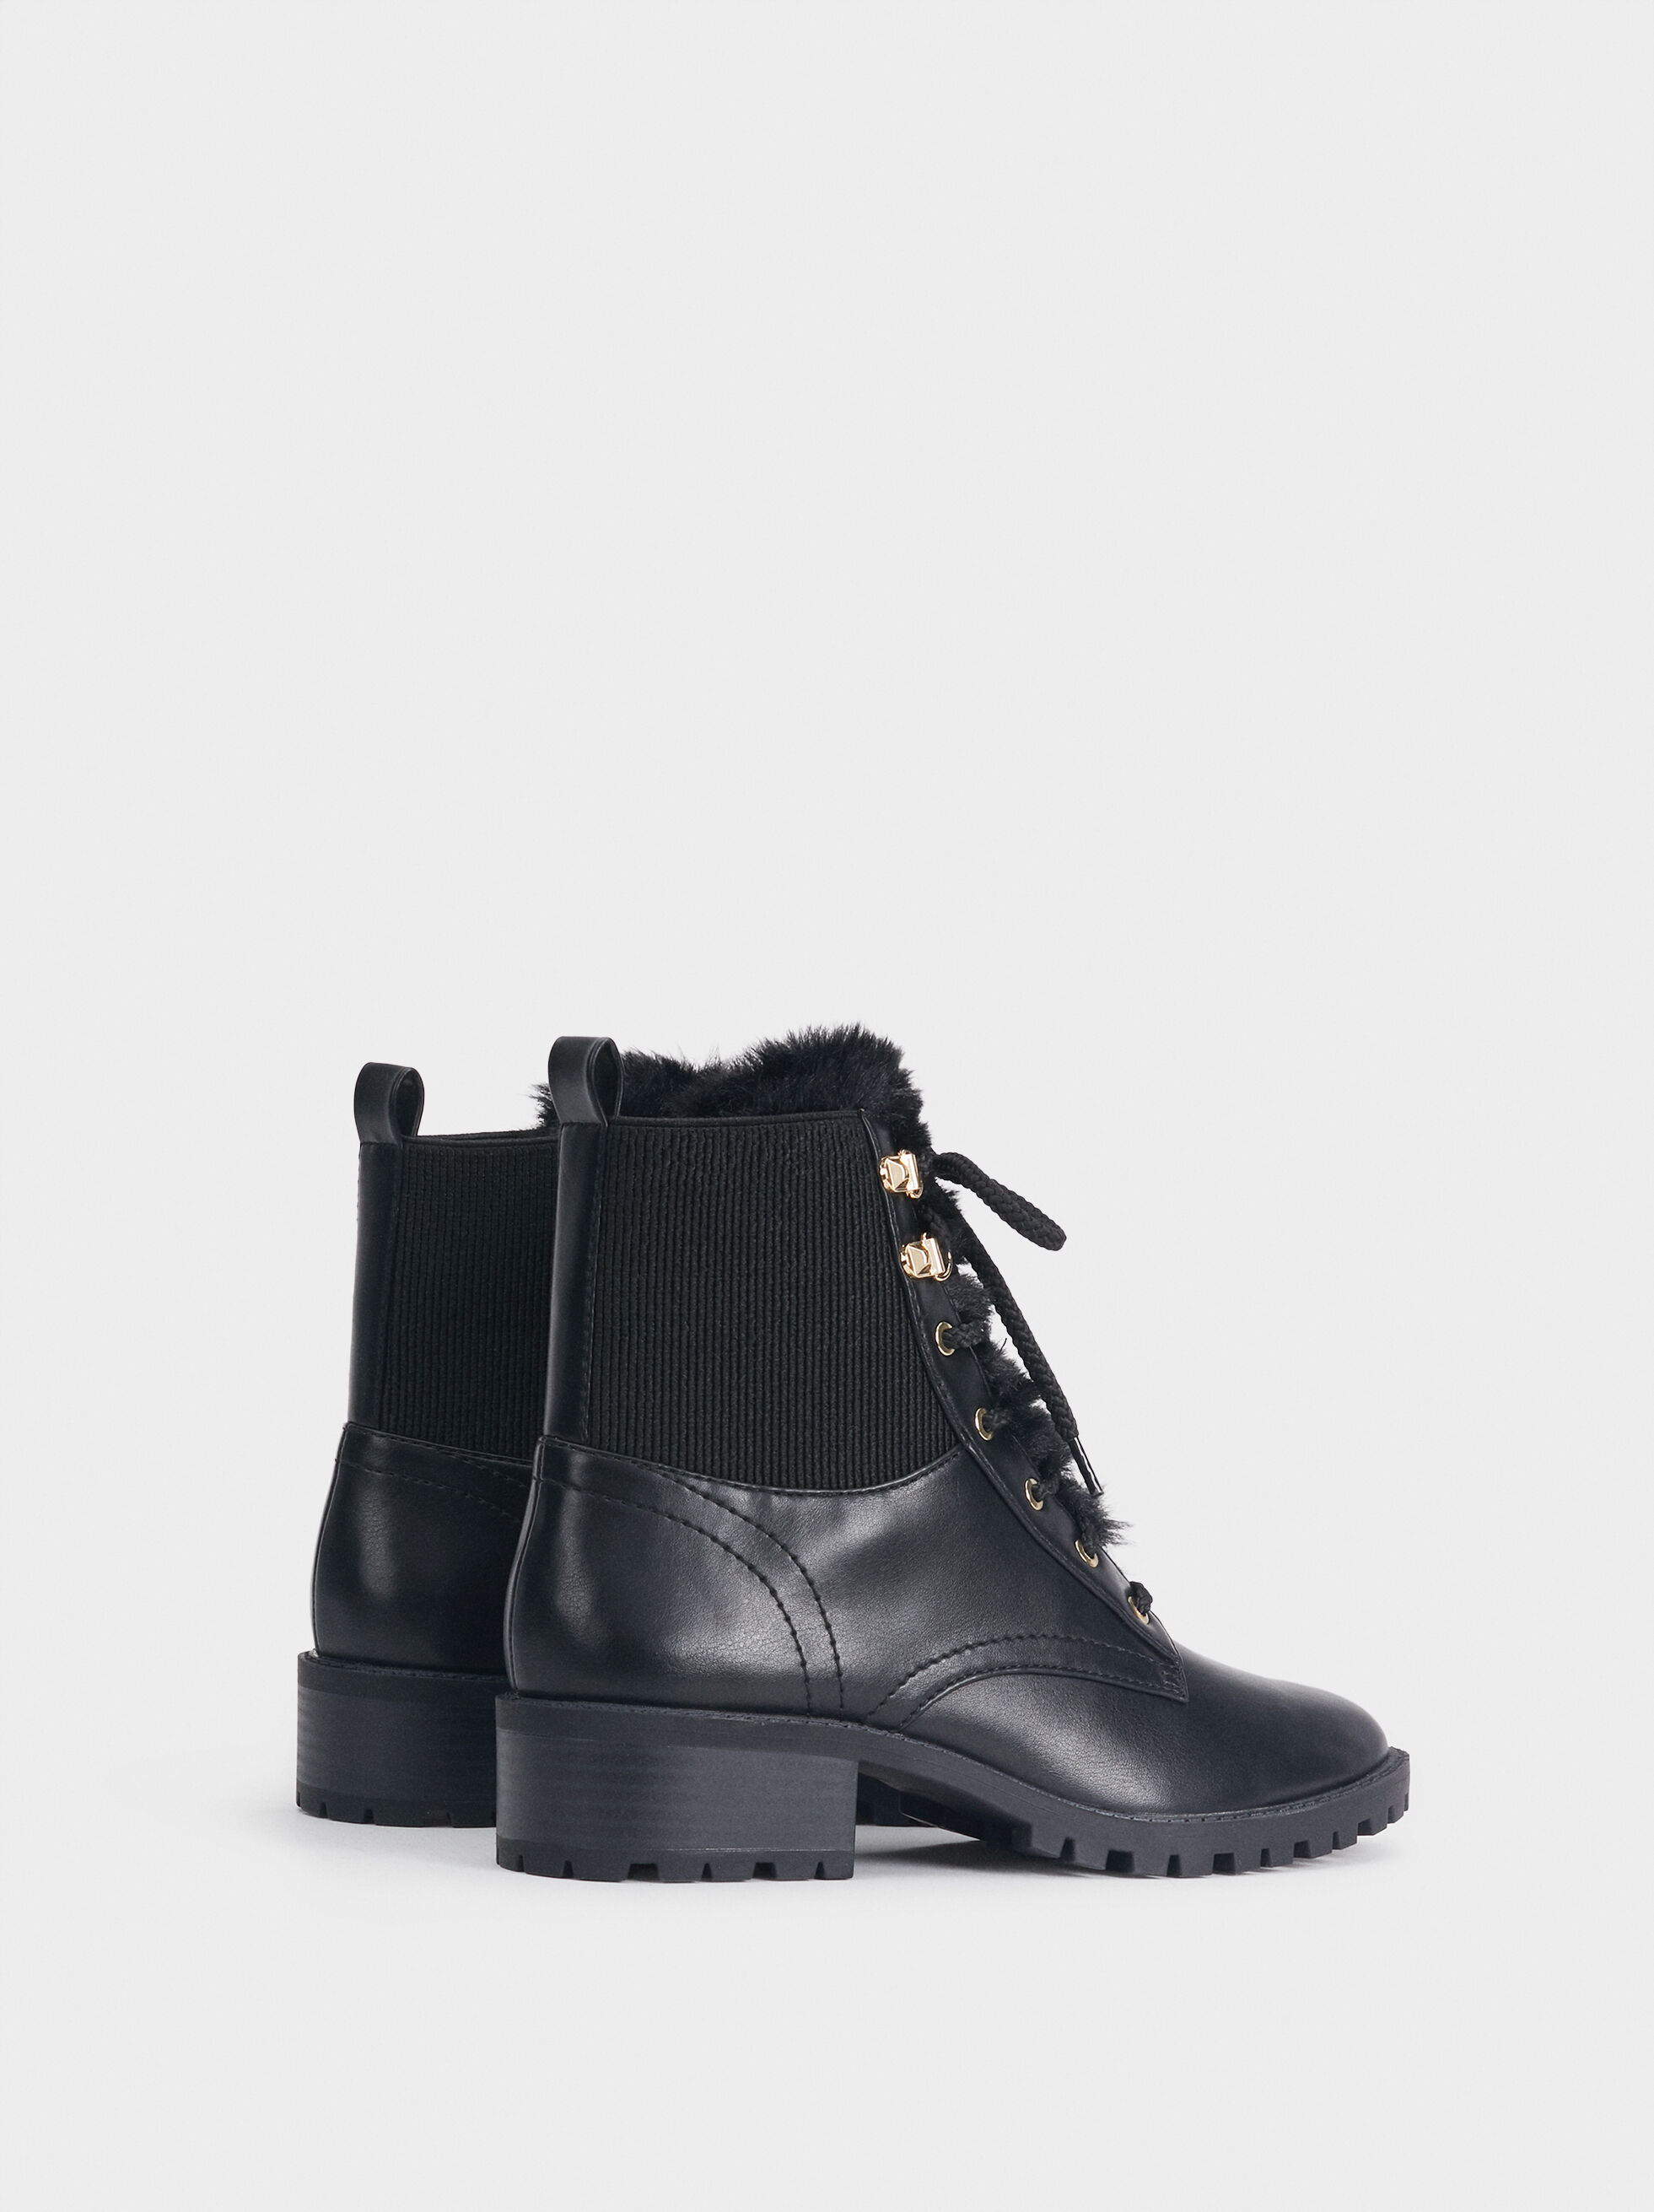 Fur Detail Ankle Boots, Black, hi-res